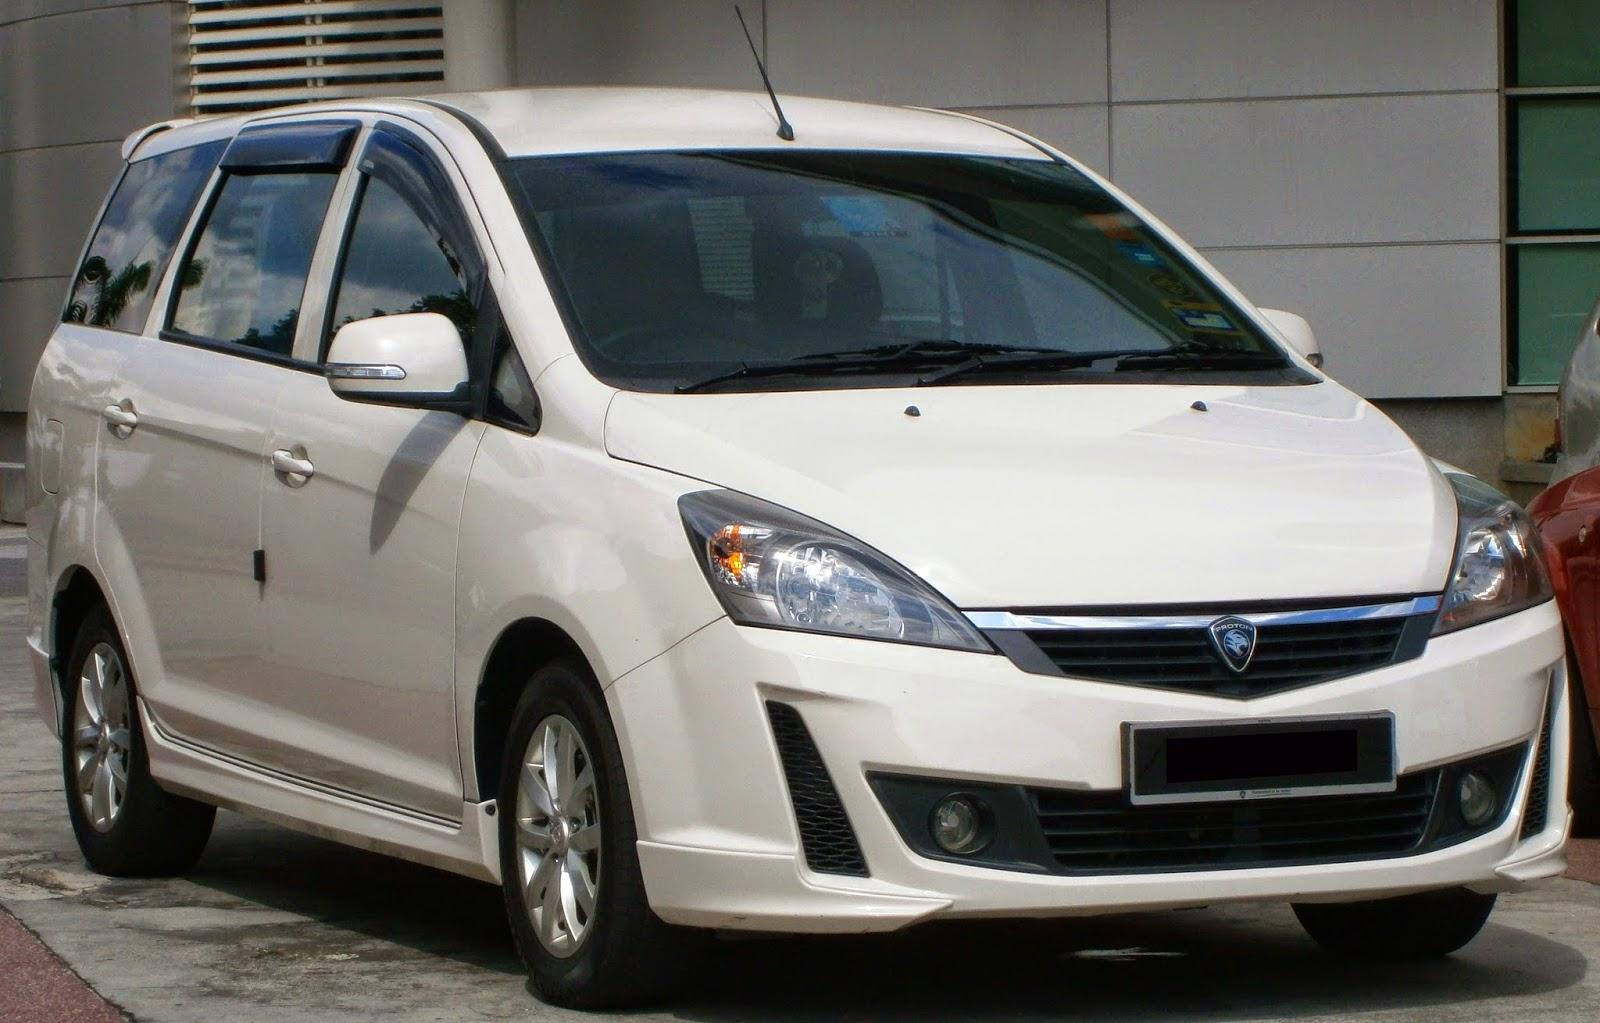 Proton Exora, Malaysia's first 7-seat MPV.